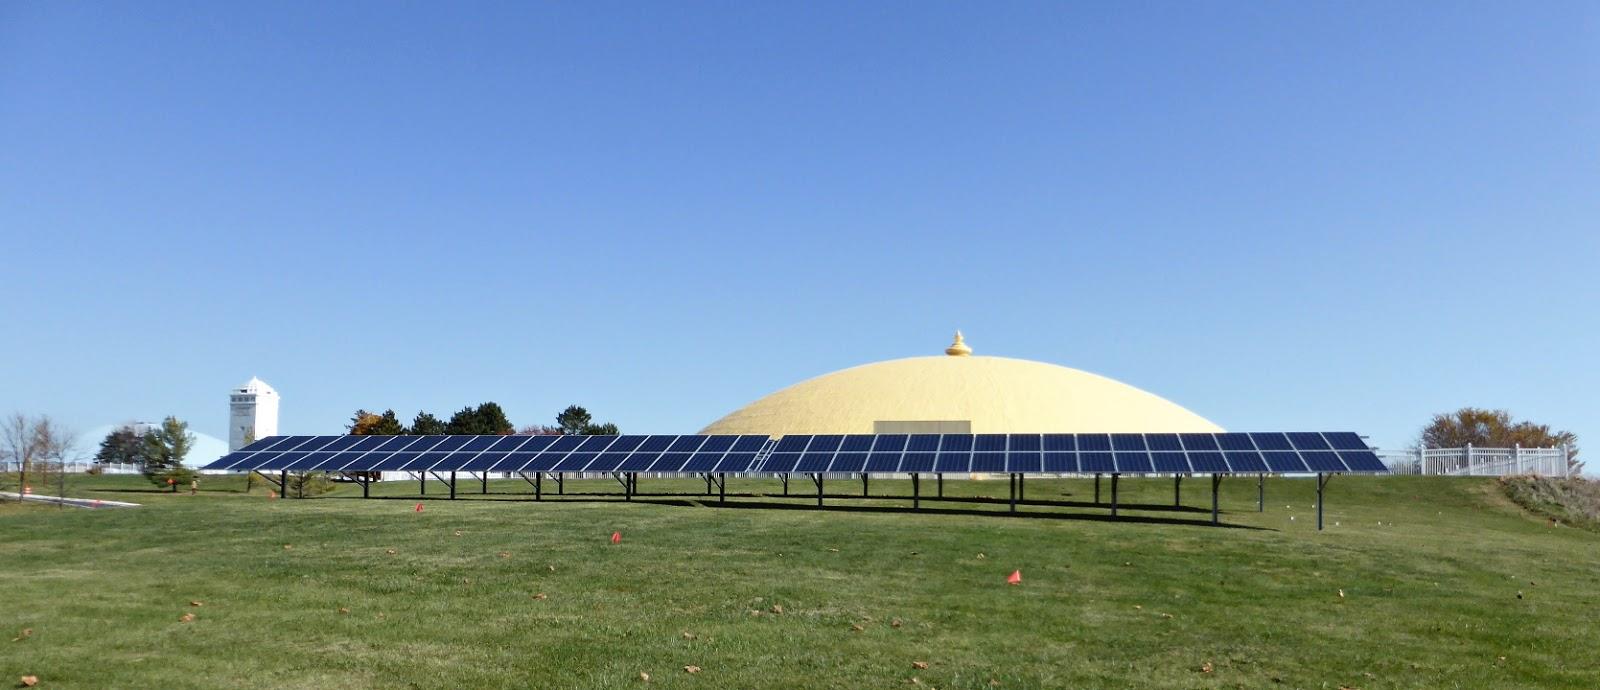 solar systems ahaped dome - photo #12